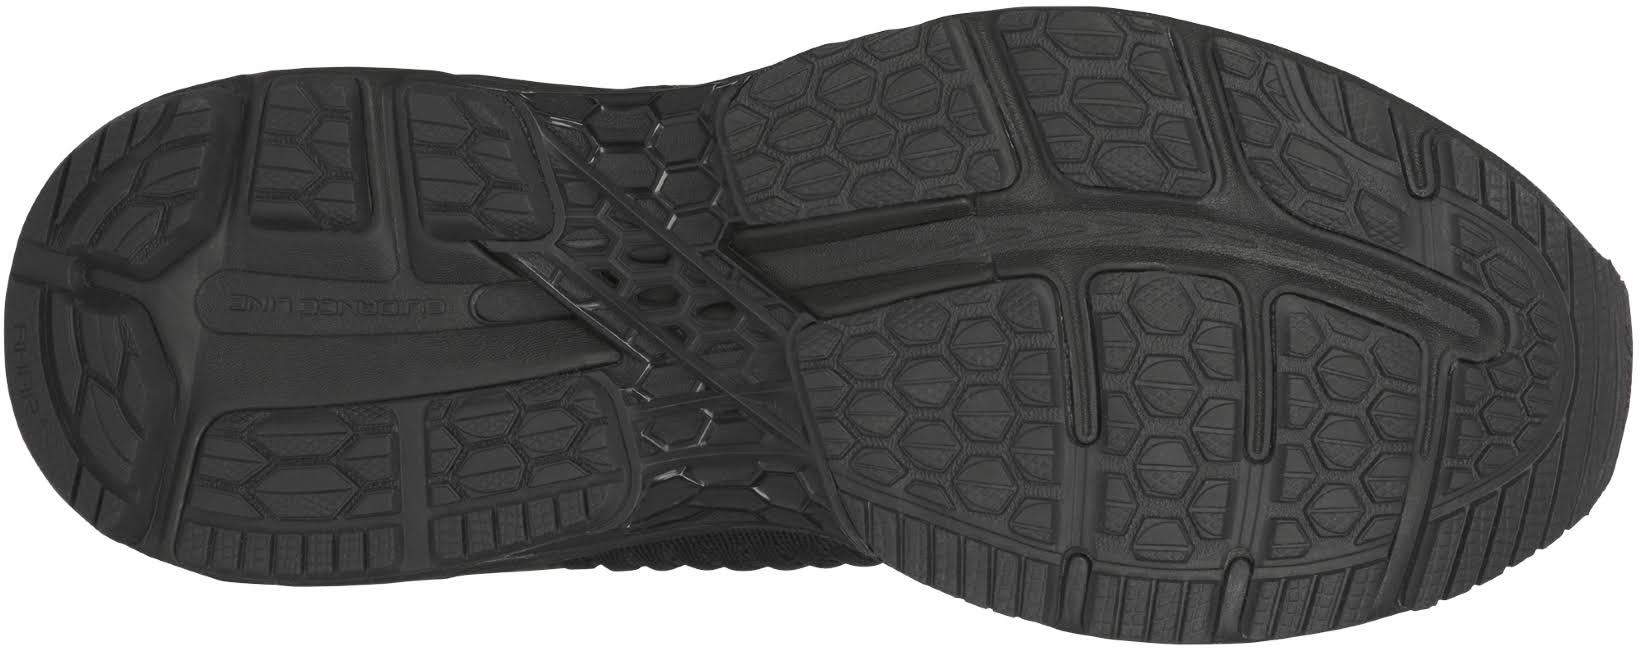 Zapatillas Gel 25 Mujer De Para Kayano Talla Negro 5 Asics Running wOqUxwXPr